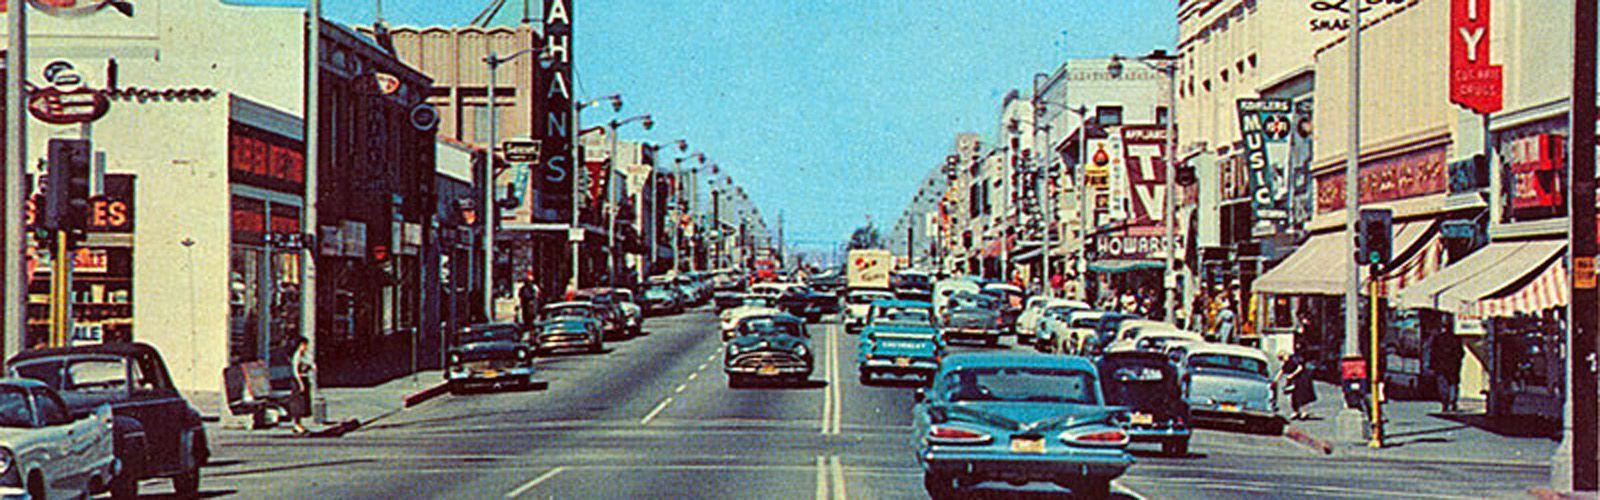 Aa Cards Long Beach Ca